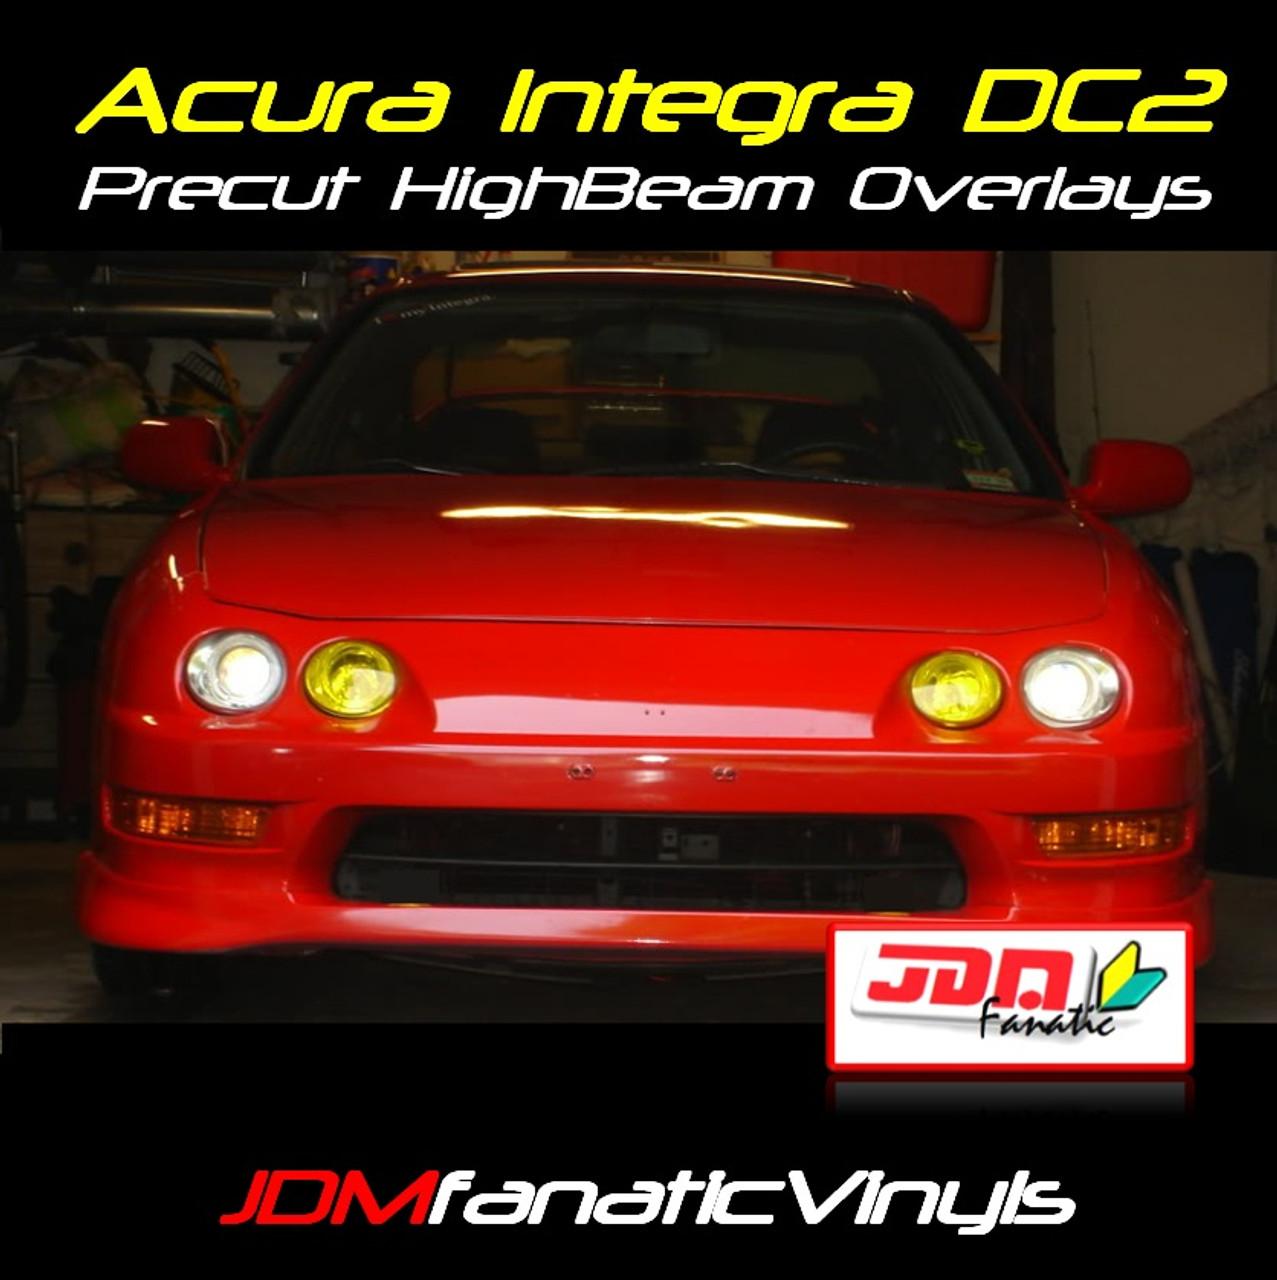 1997 2001 Acura Integra Dc2 Precut Yellow High Beam Head Light Overlays Tint